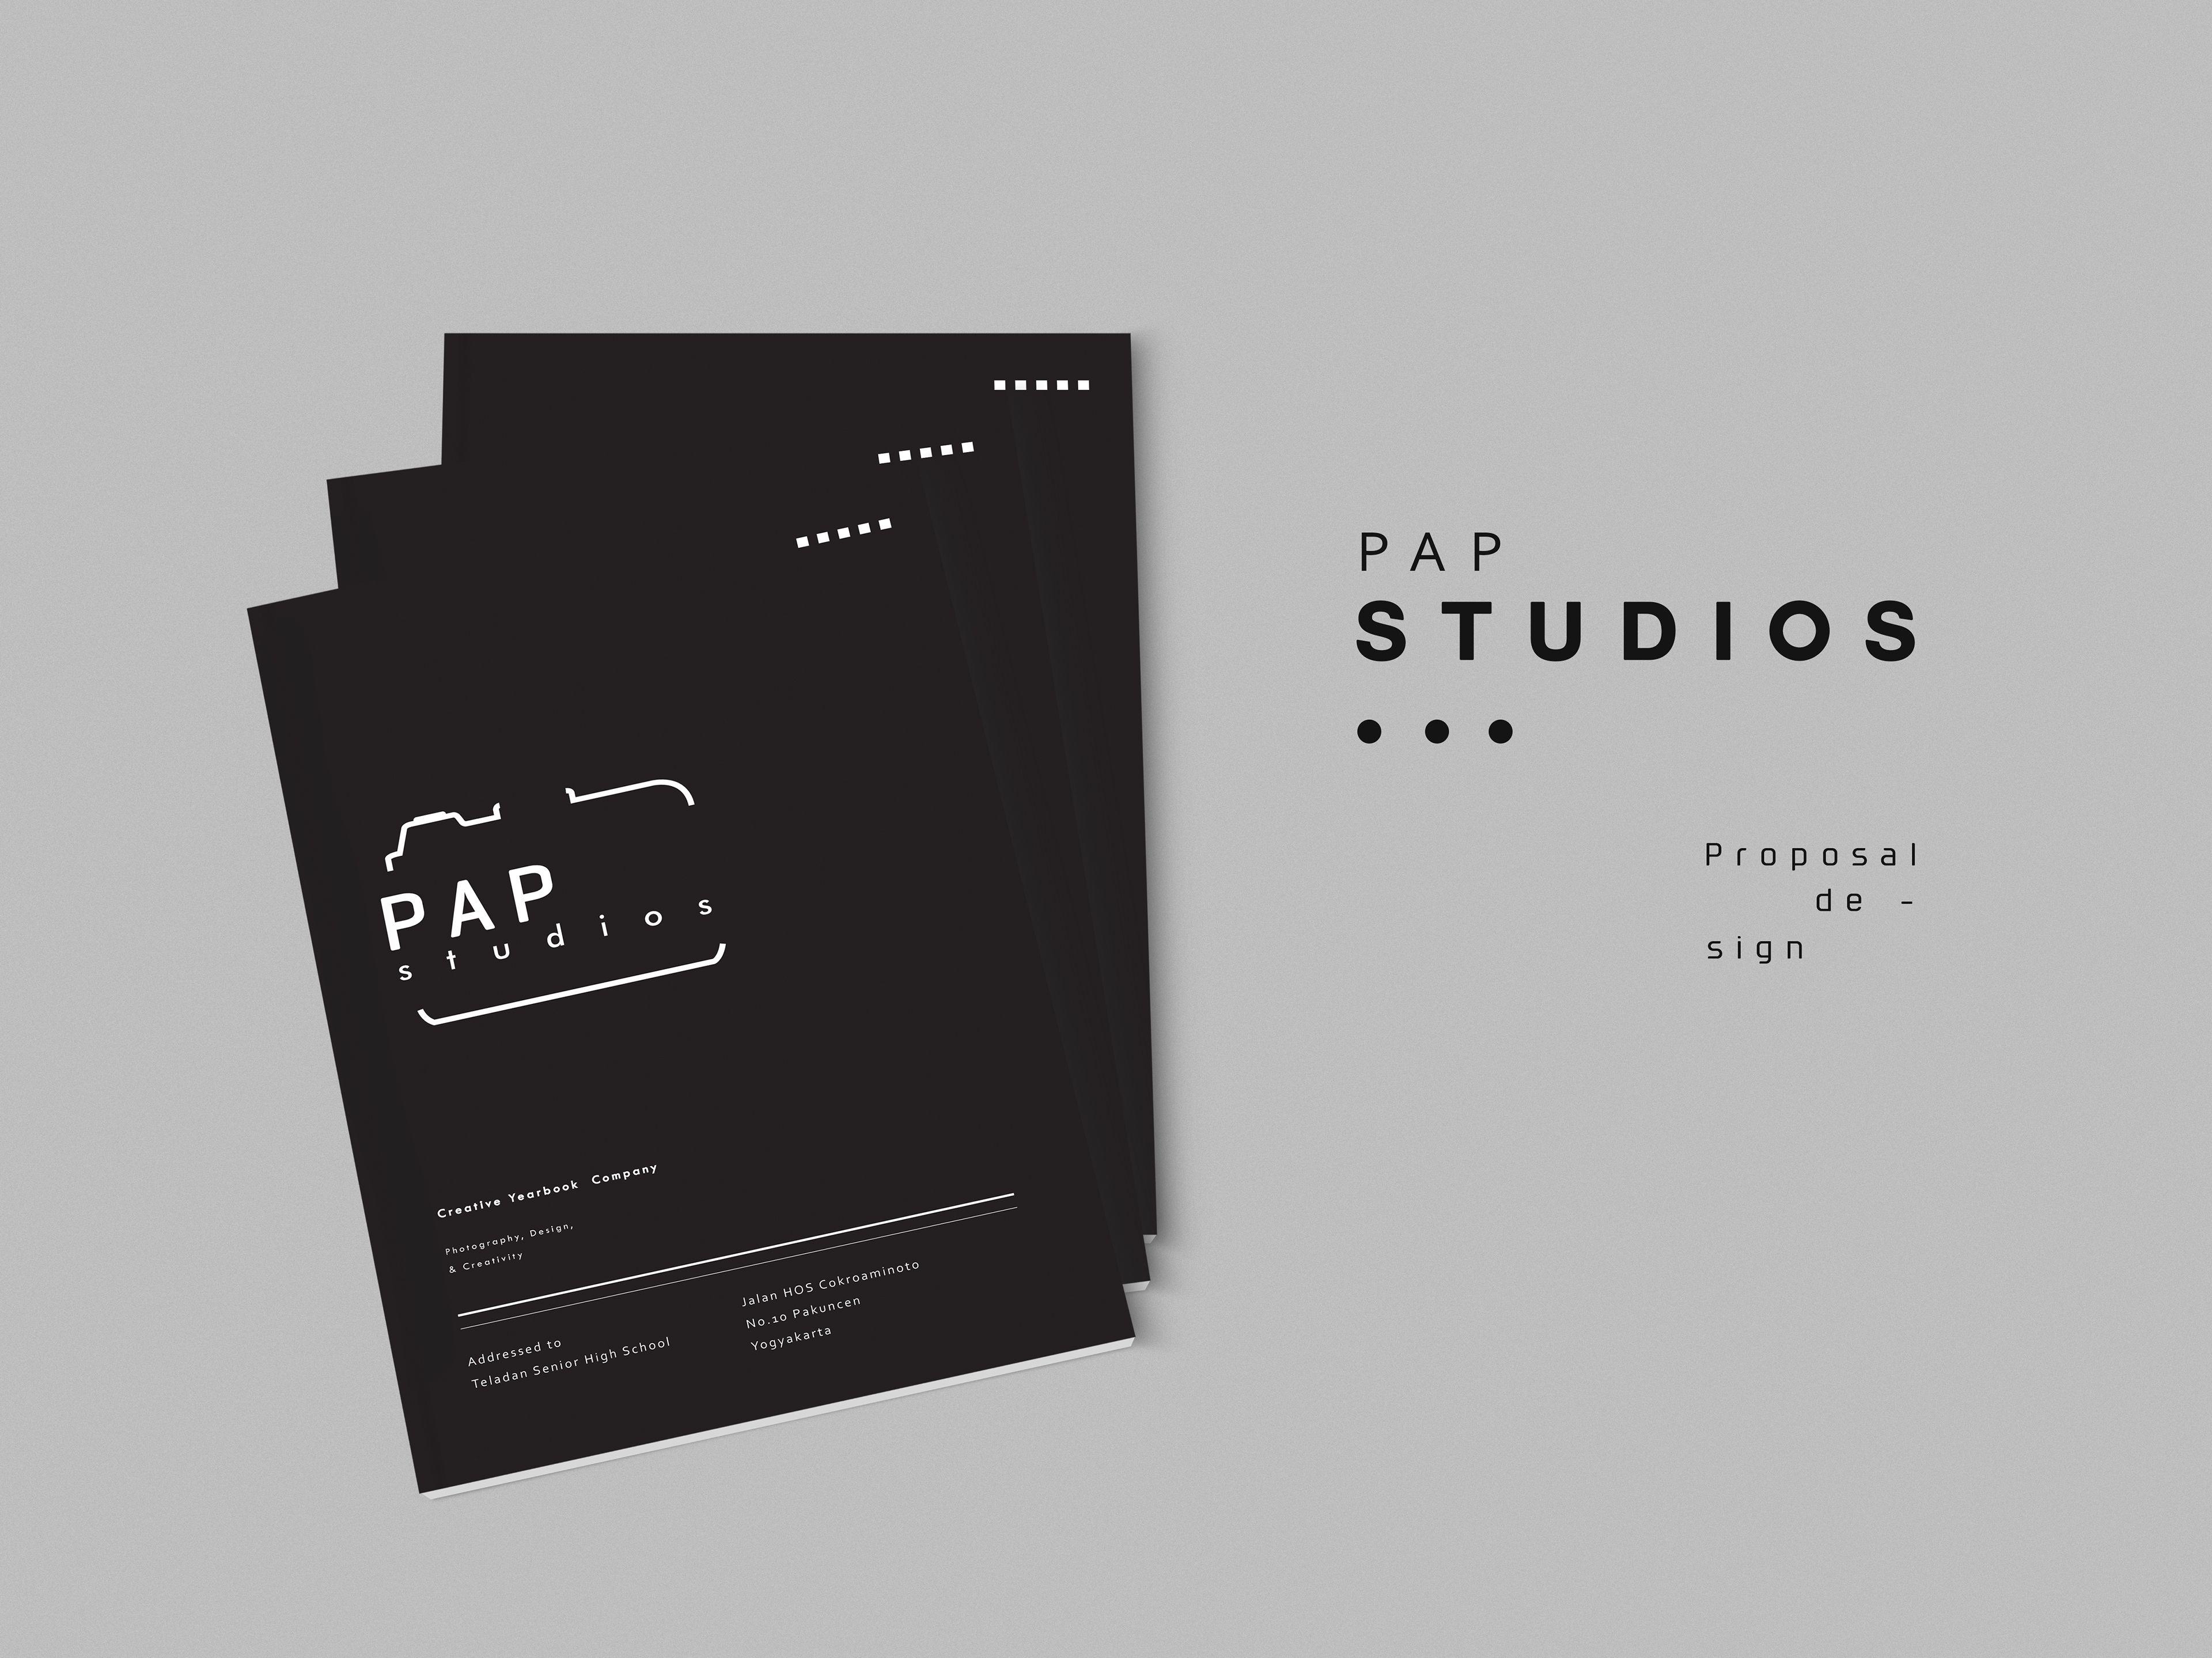 Adobe Minimal Work for pap studios created